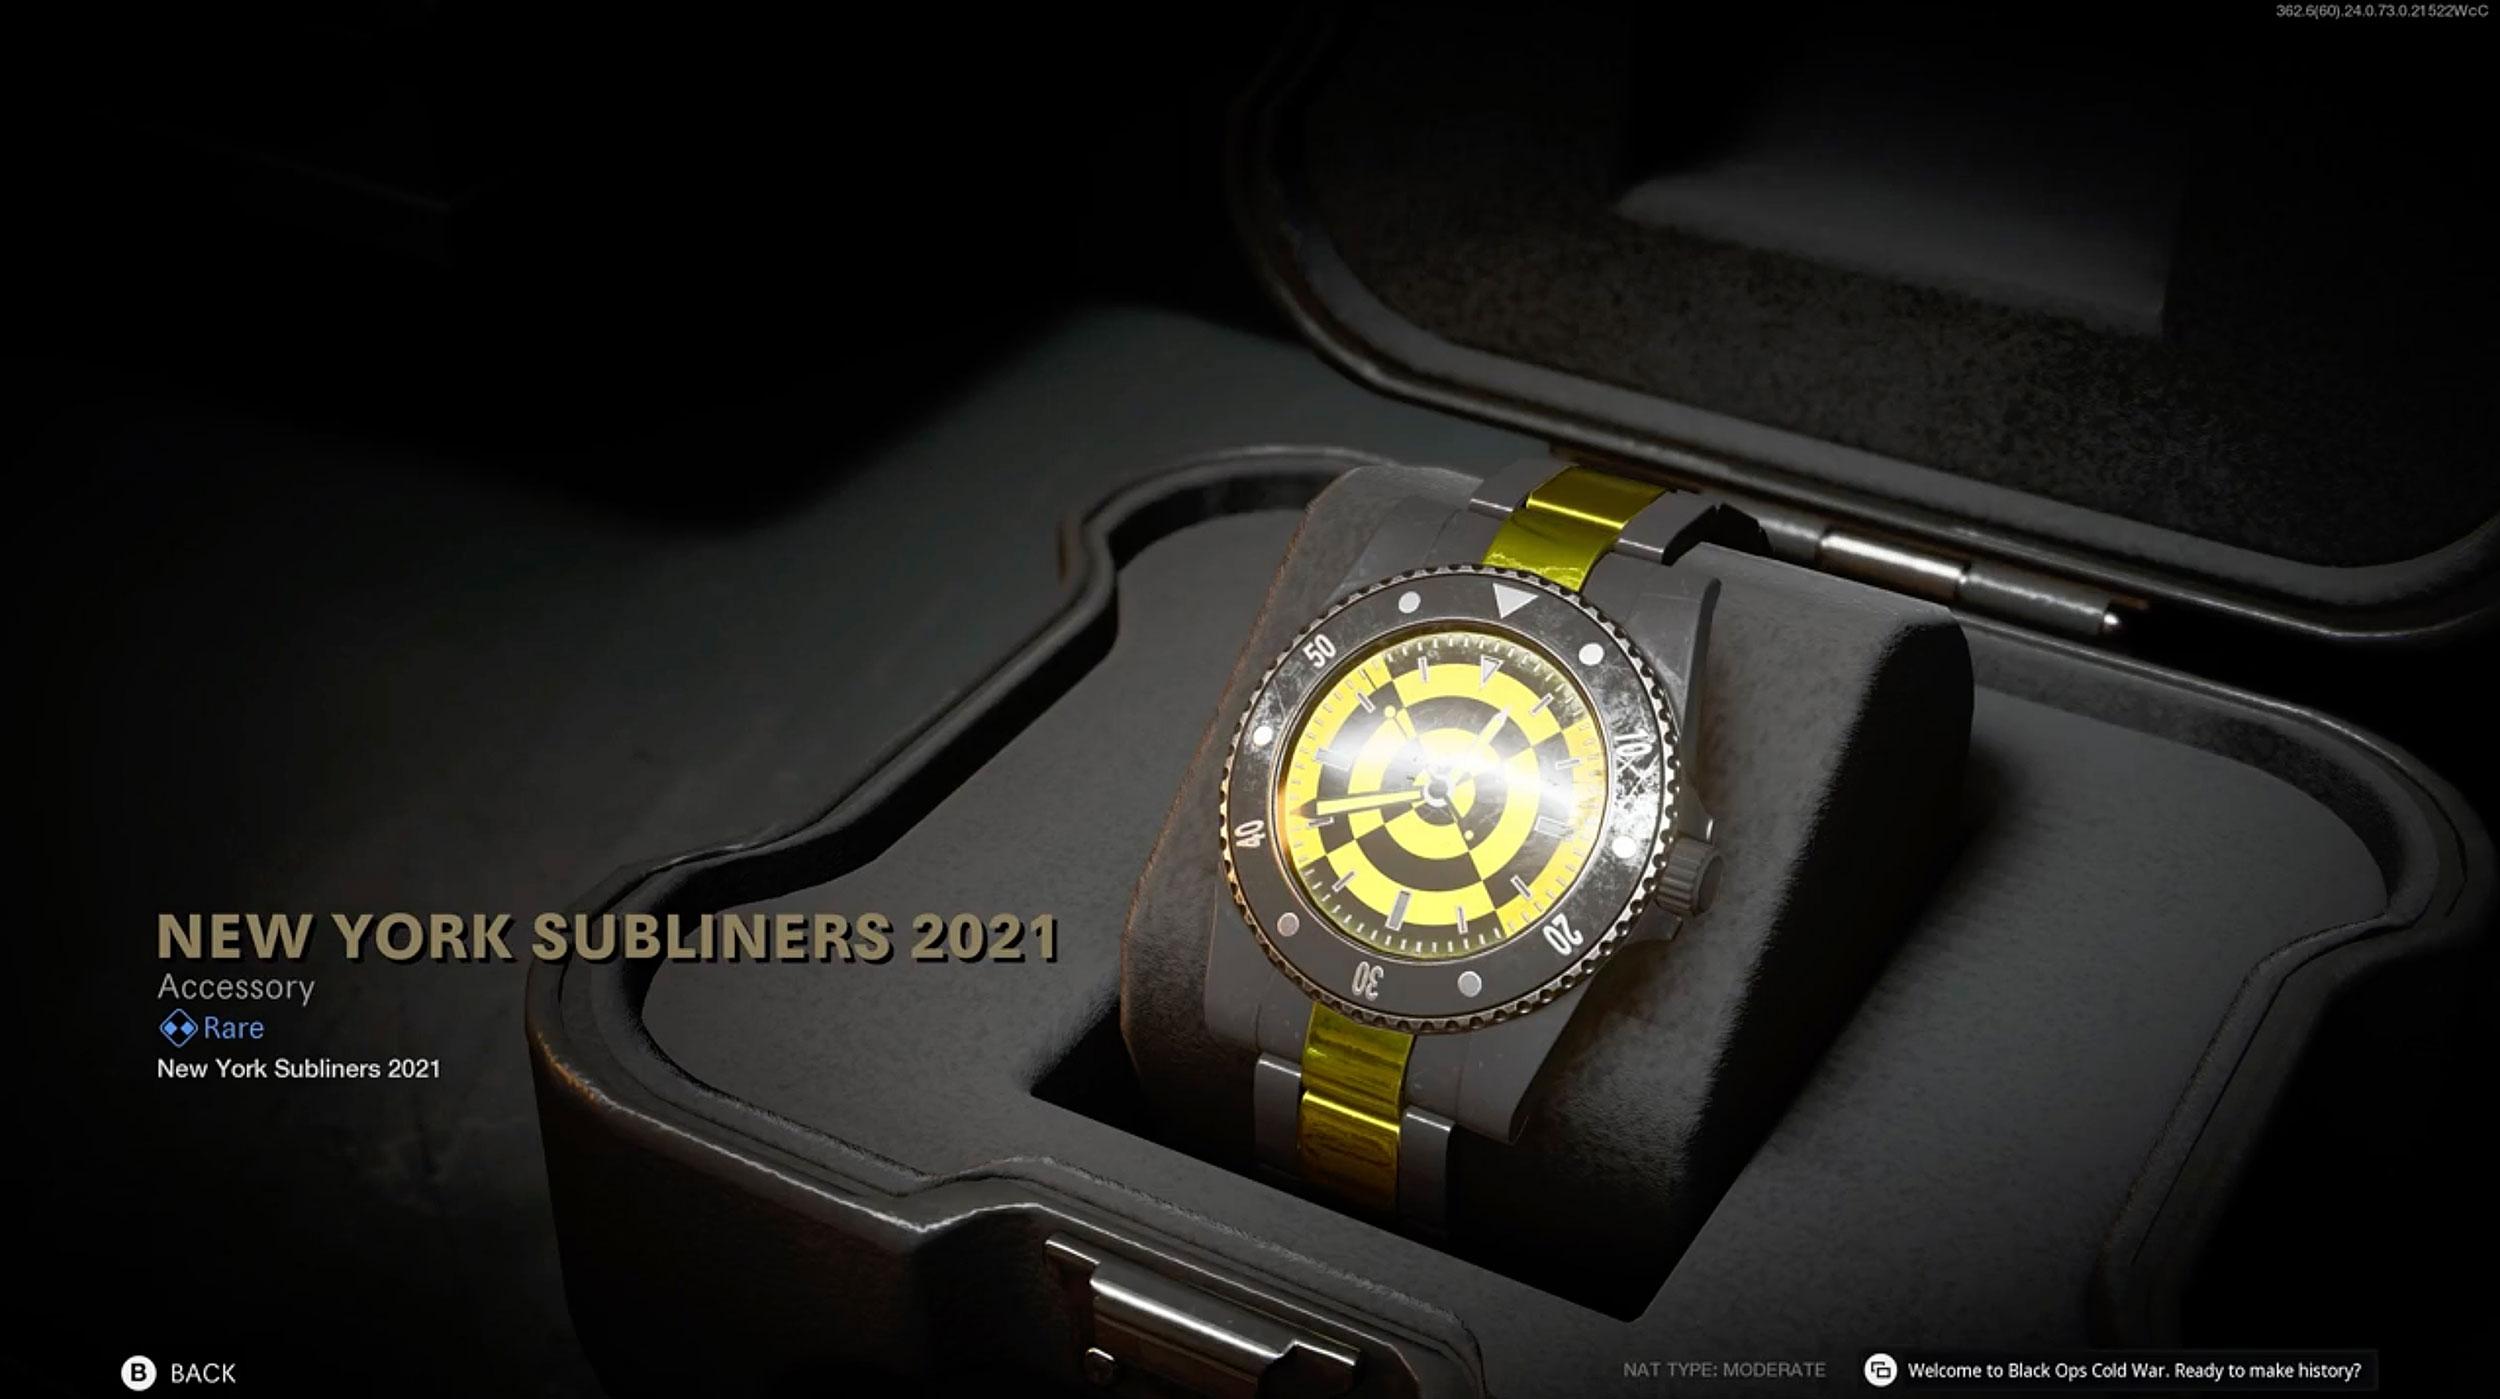 Subliners, Mother Design, Visual Identity, Logo, Yaya Xu, Matt van Leeuwen, Matthijs van Leeuwen, Andbox, Call of Duty, typography